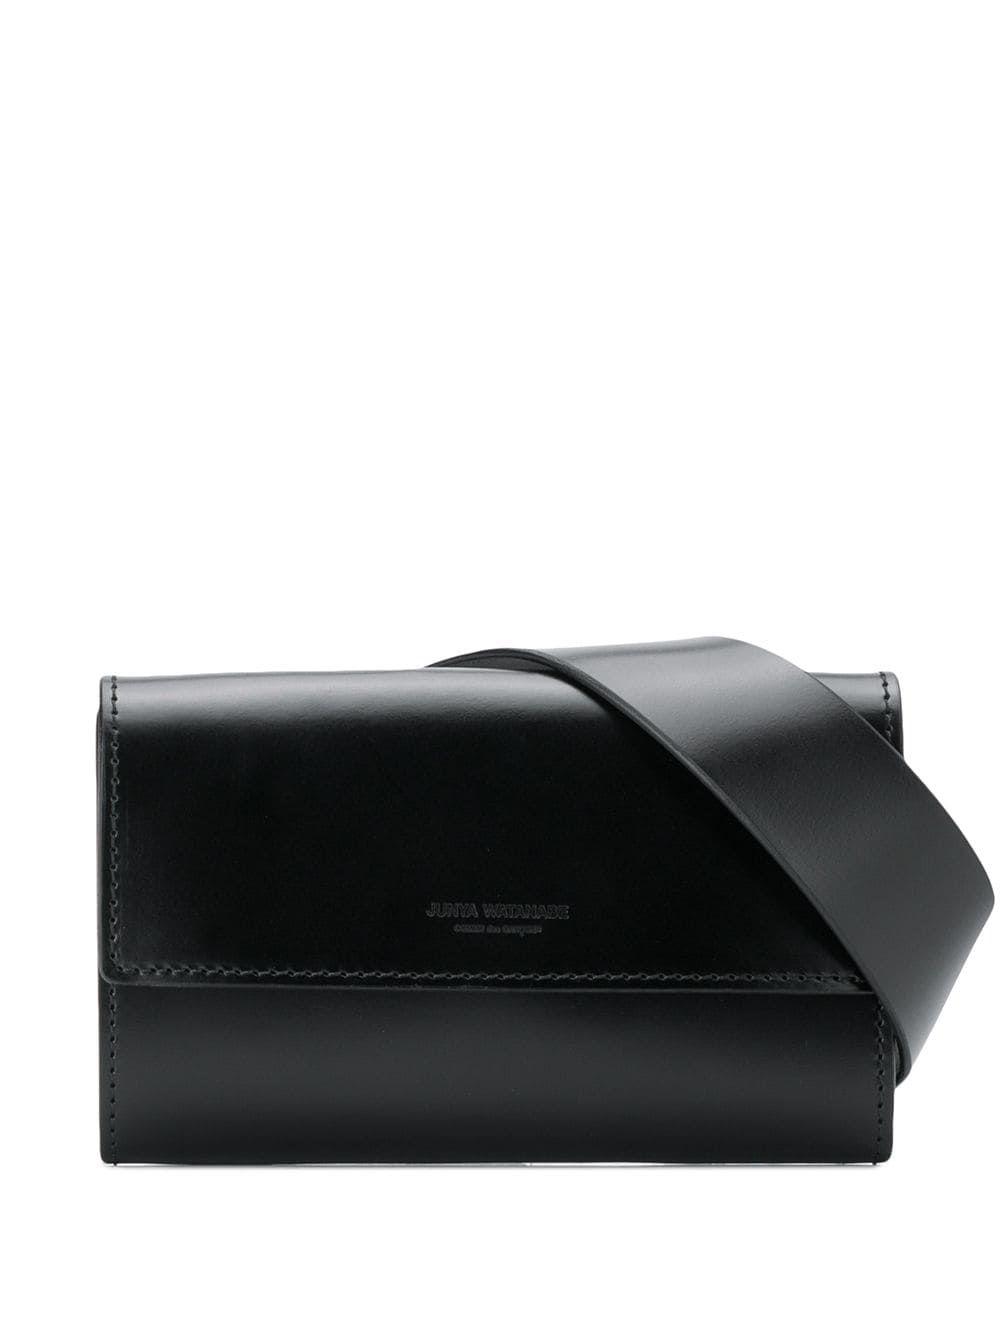 Leather beltbag